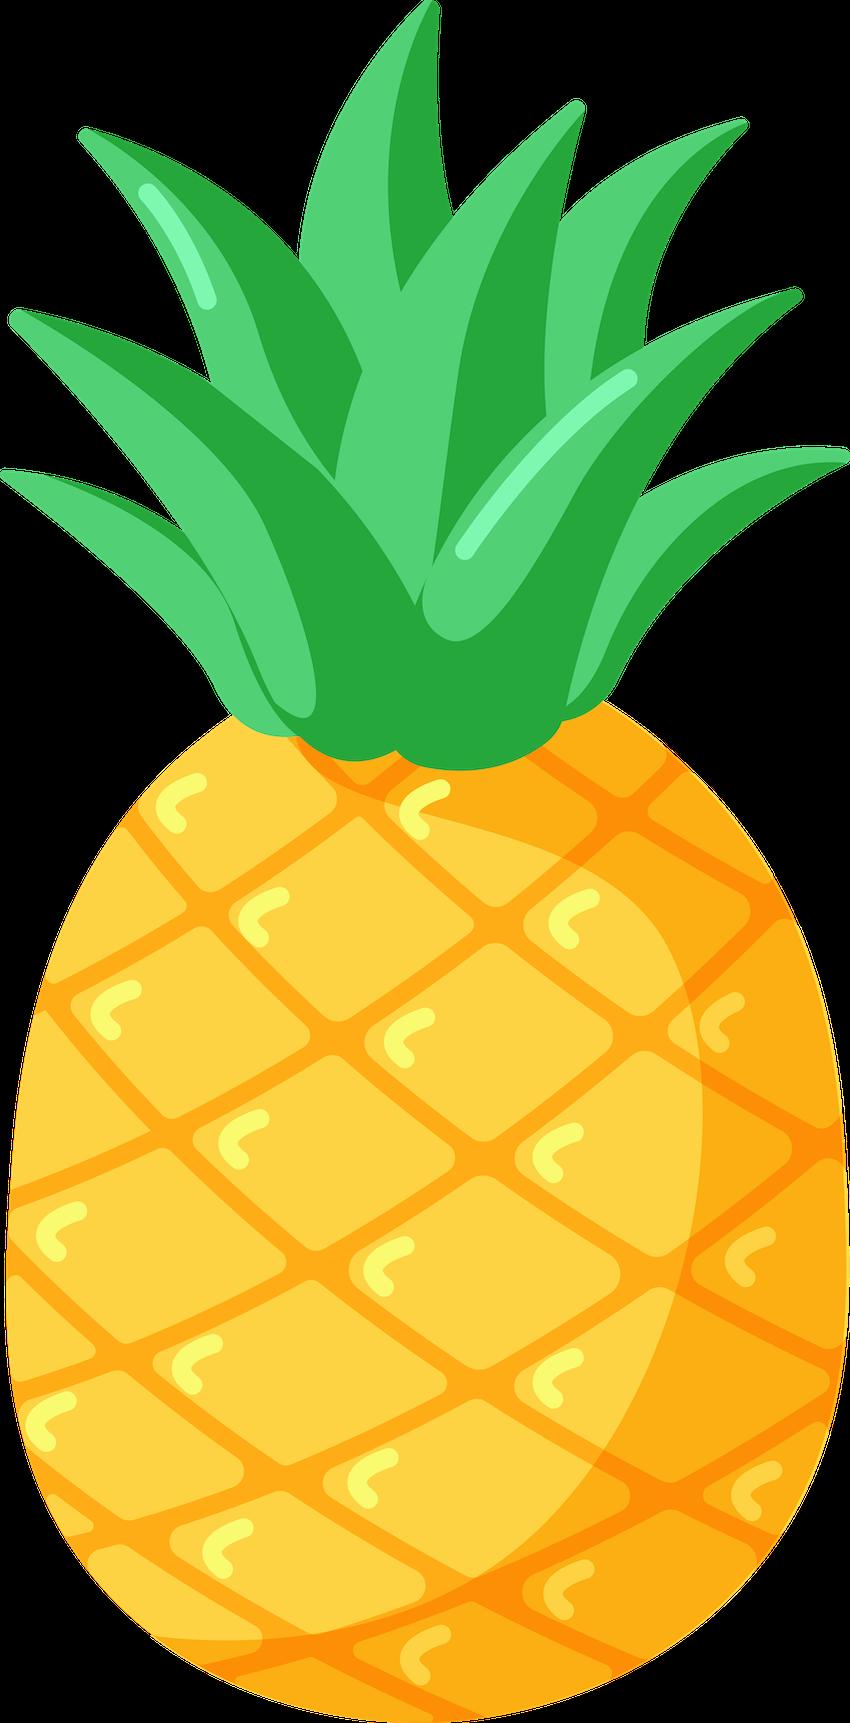 fruits pineapple anglais